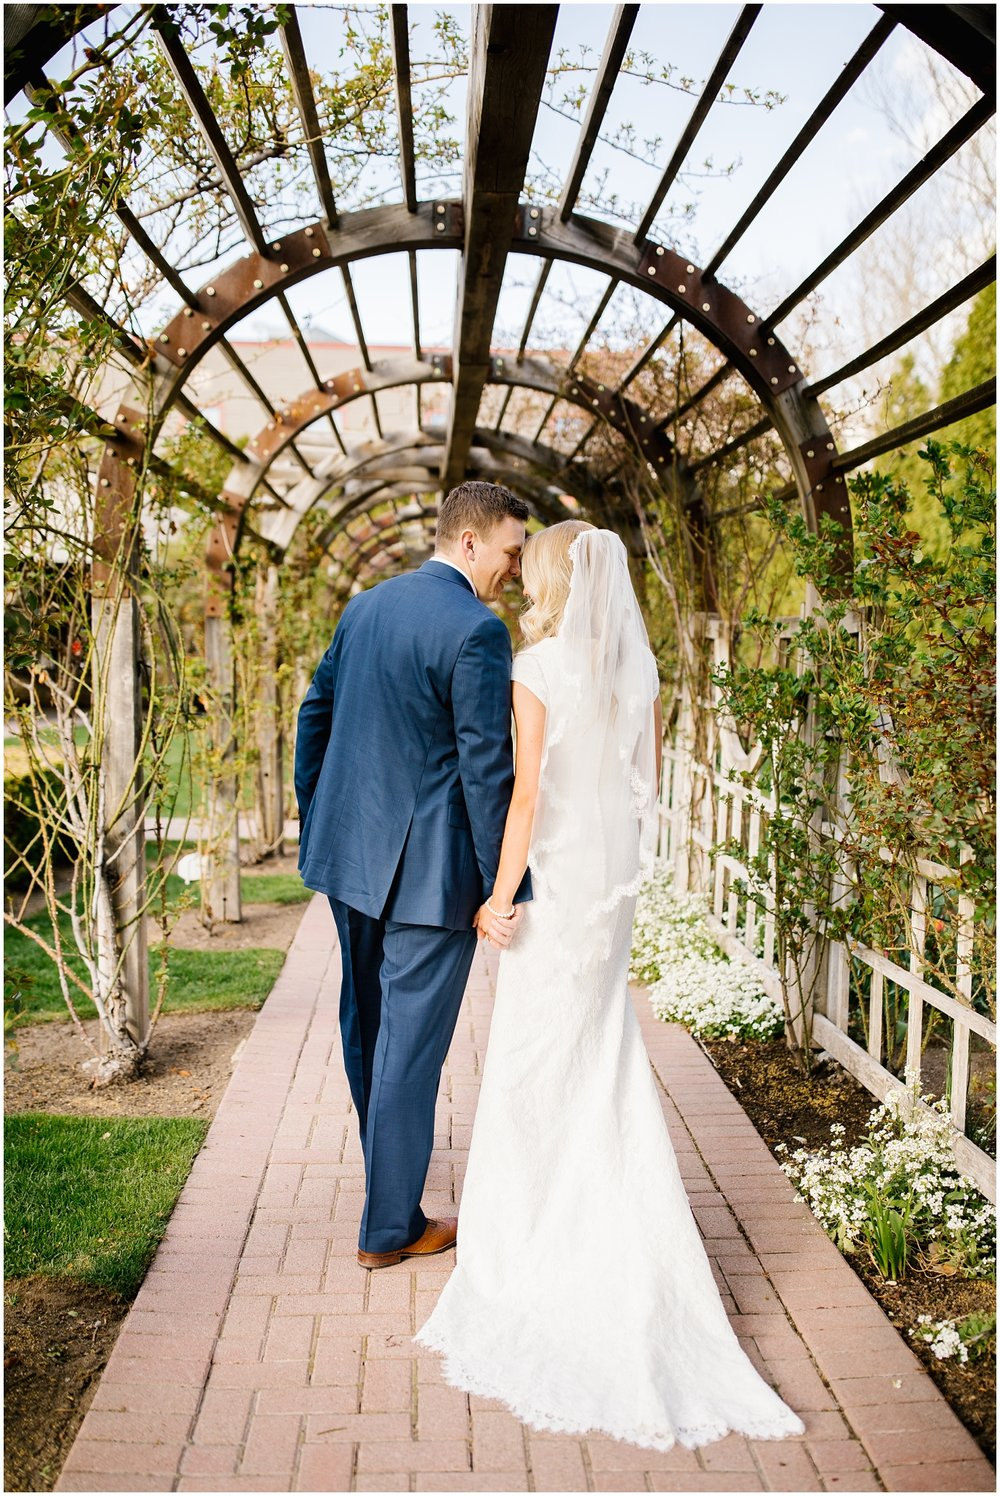 TA-Bridals-11_Lizzie-B-Imagery-Utah-Wedding-Photographer-Park-City-Salt-Lake-City-Thanksgiving-Point-Ashton-Gardens-Lehi-Utah.jpg